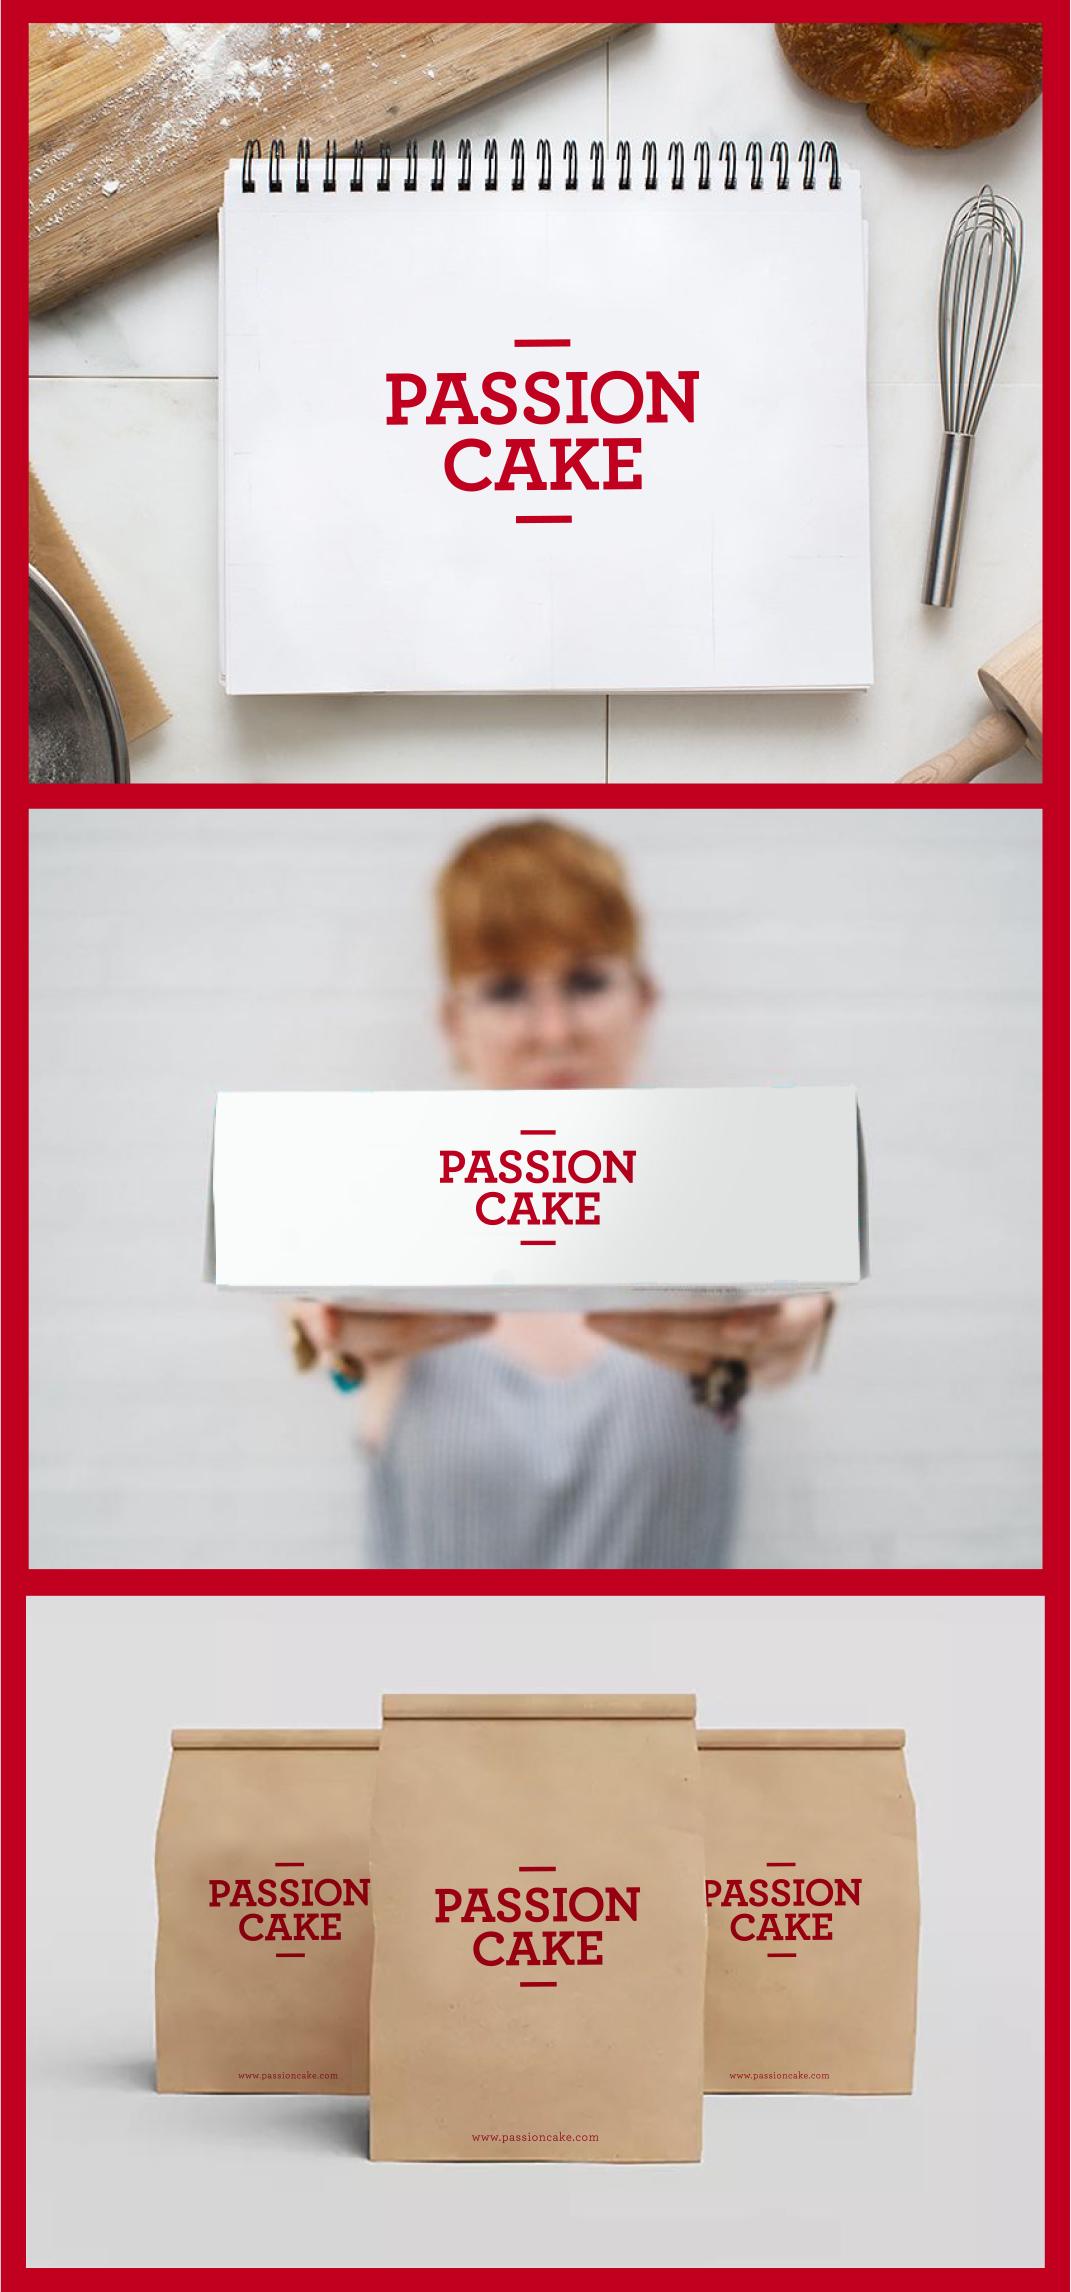 """Passion Cake"" Brand Identity"